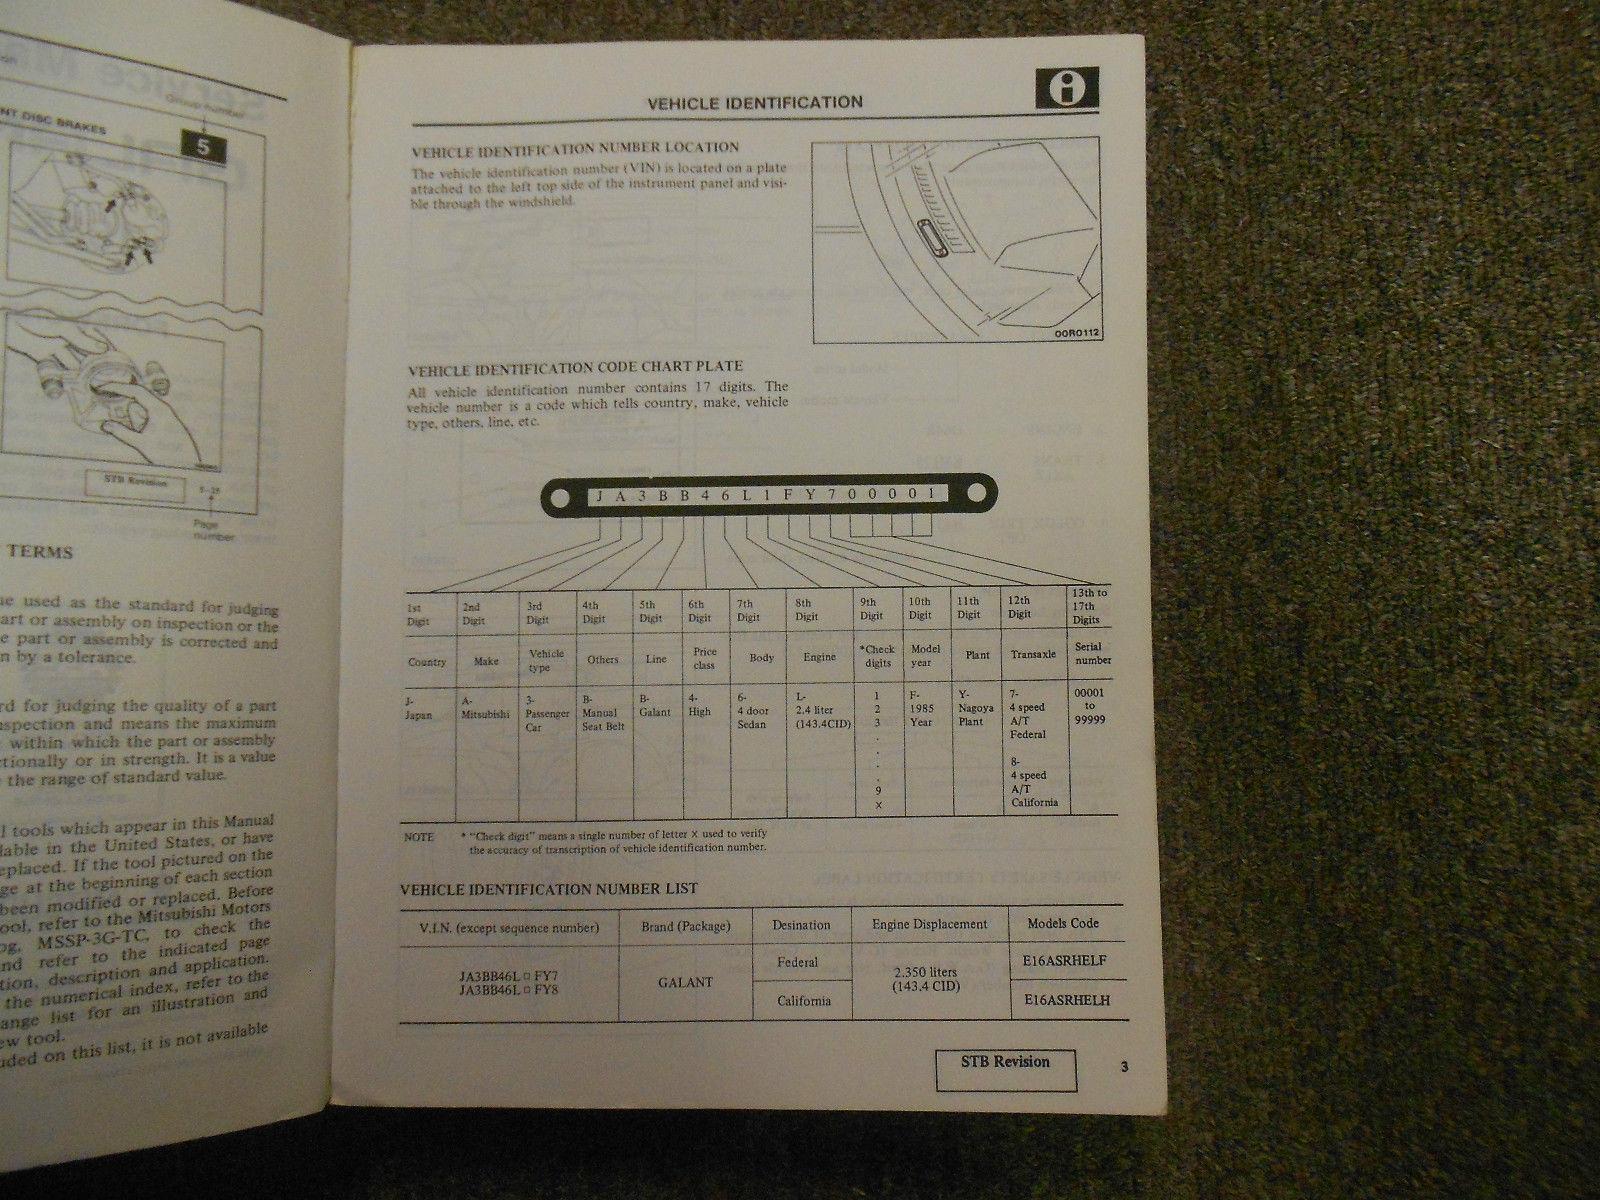 1985 MITSUBISHI Galant Service Repair Shop Manual SET 2 VOL FACTORY OEM BOOK 85